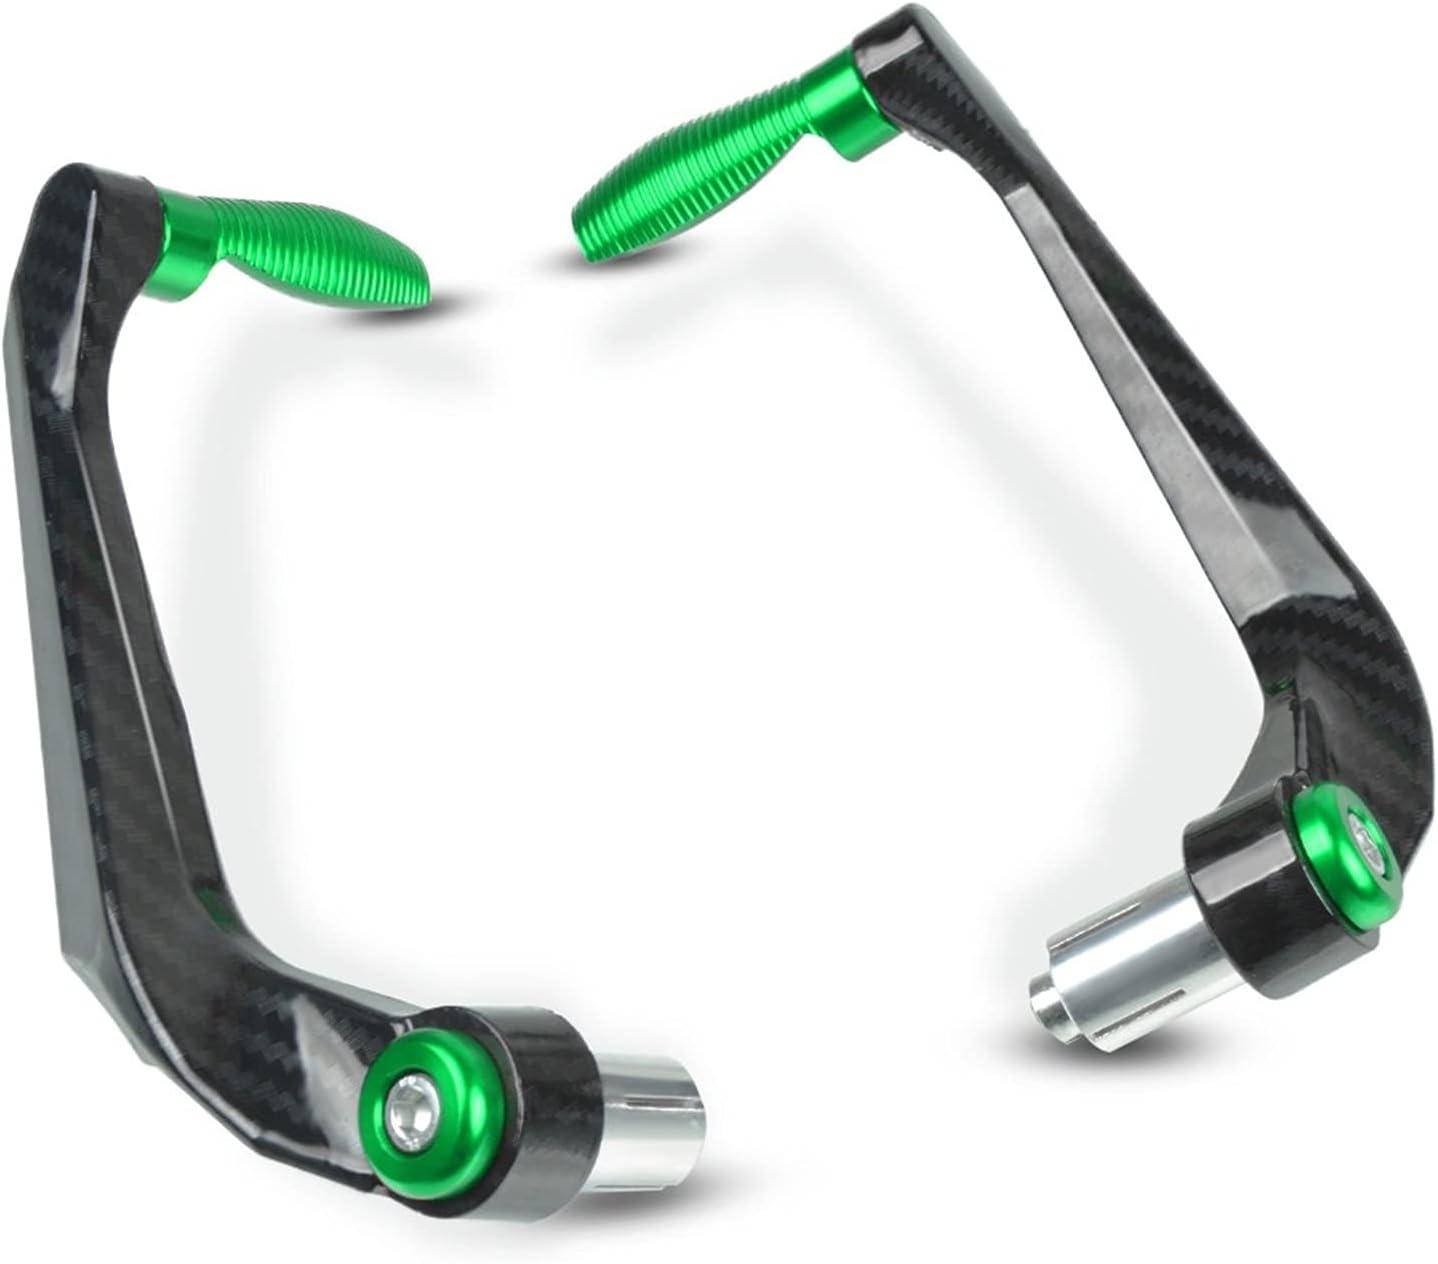 Max 62% OFF Xinmei-cycling Fees free Motorcycle Handlebar Grips Clutch Gu Brake Levers